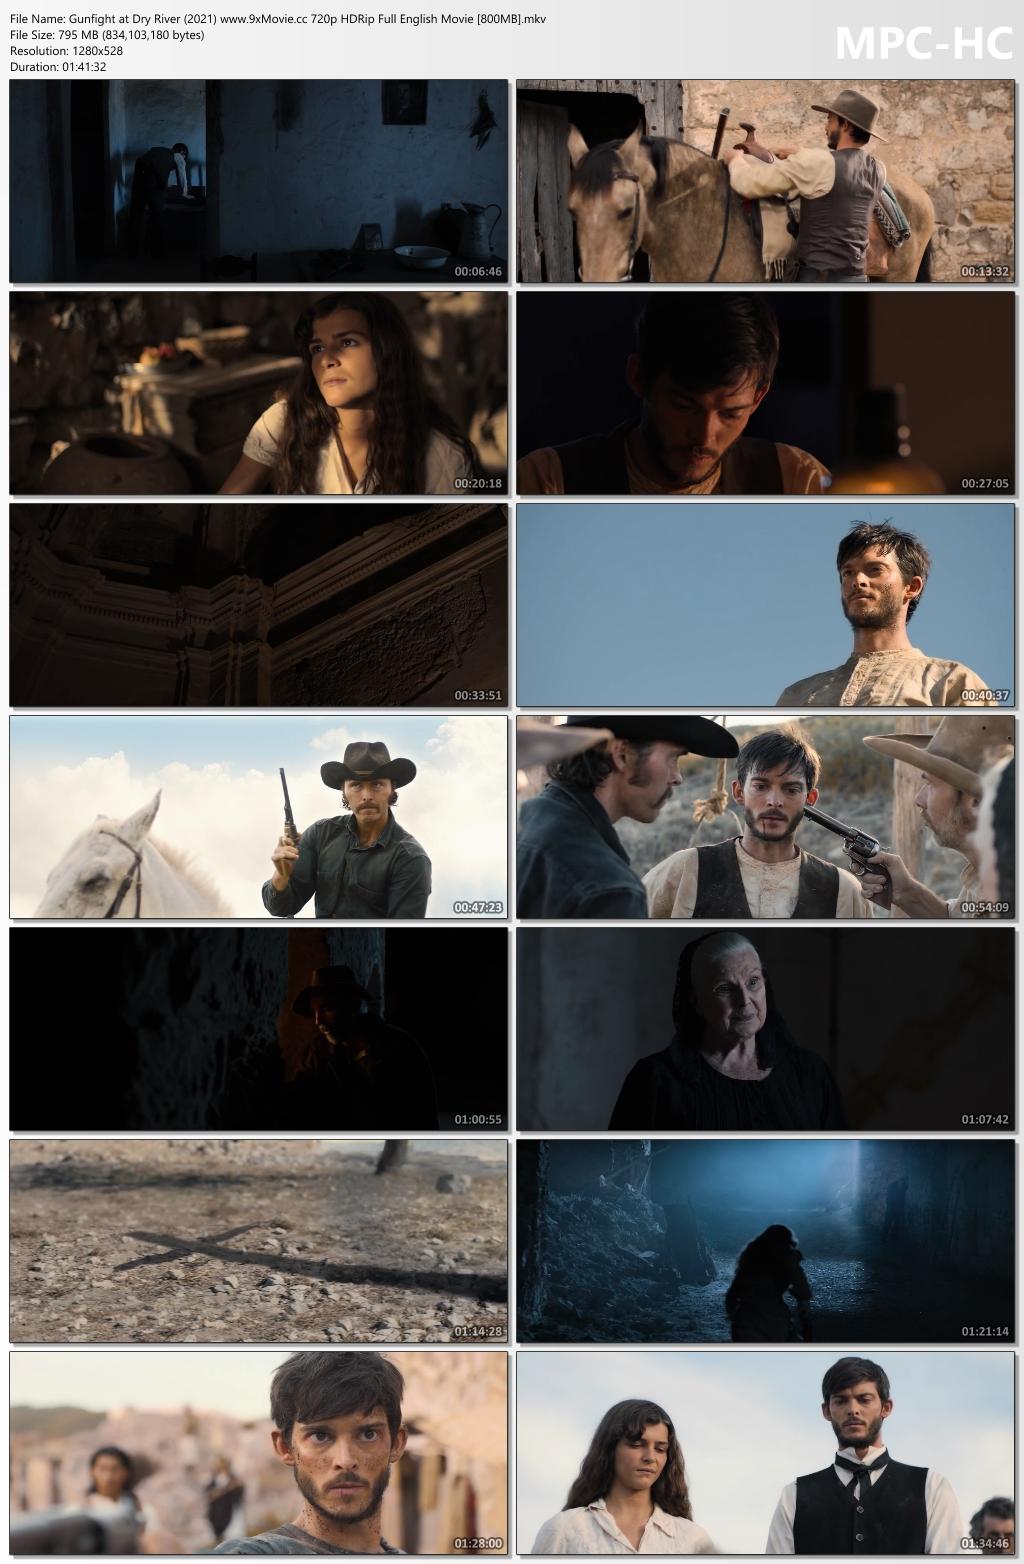 Gunfight-at-Dry-River-2021-www-9x-Movie-cc-720p-HDRip-Full-English-Movie-800-MB-mkv